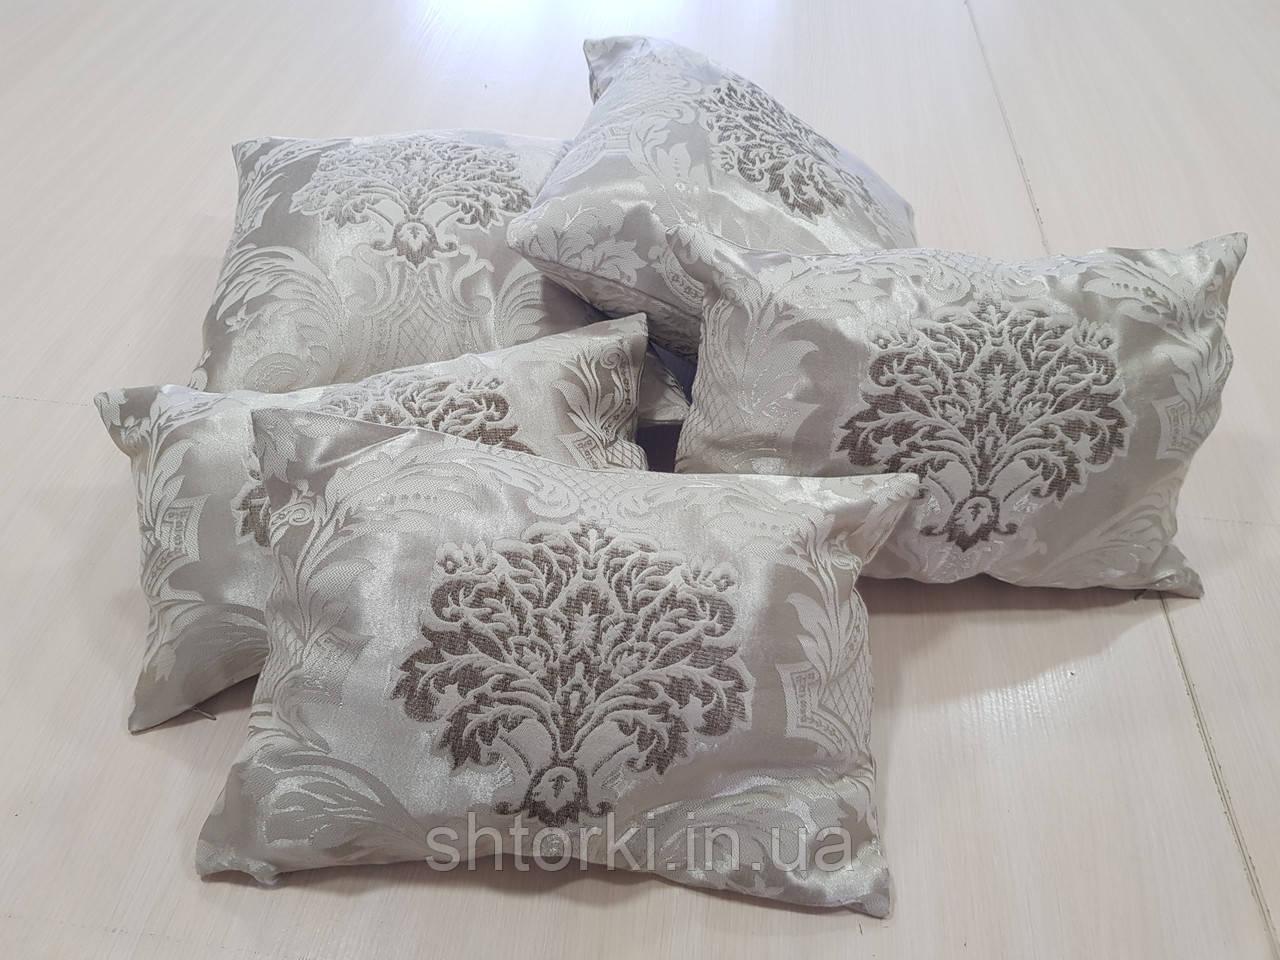 Комплект подушек коронки бежевые, 5шт